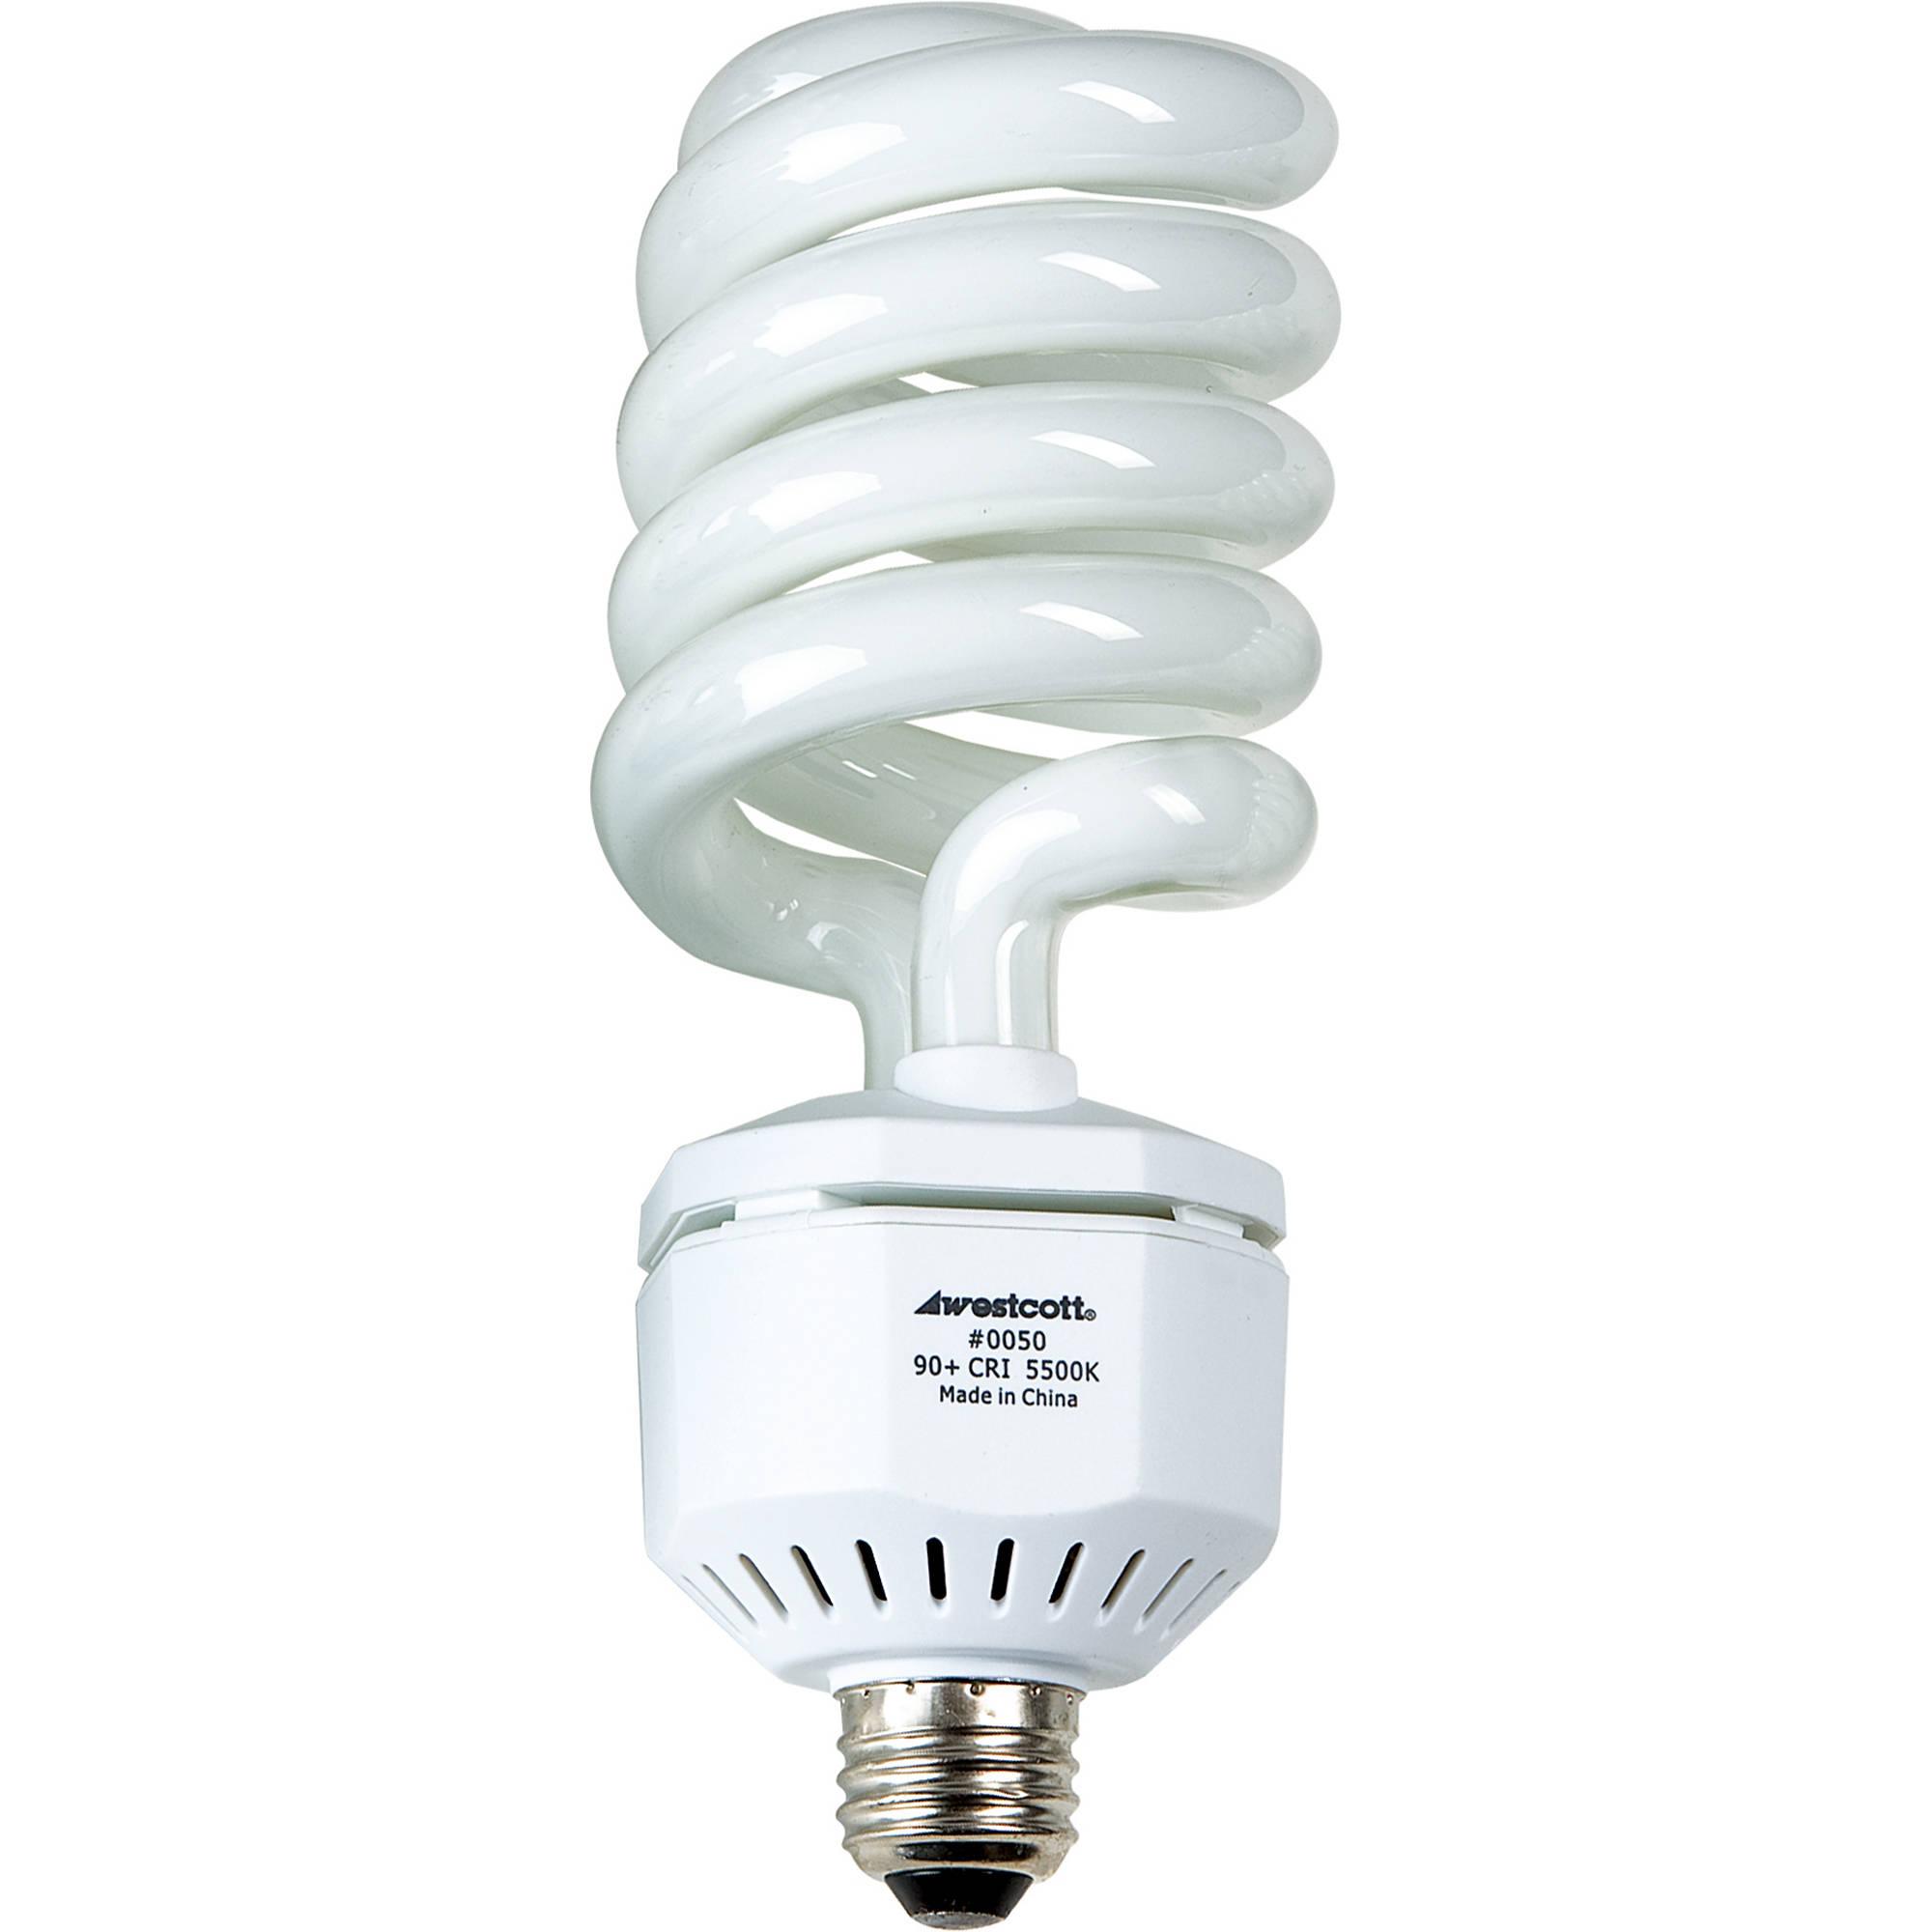 Westcott Fluorescent Lamp - 50 Watts/120 Volts 5500K 0050 B&H